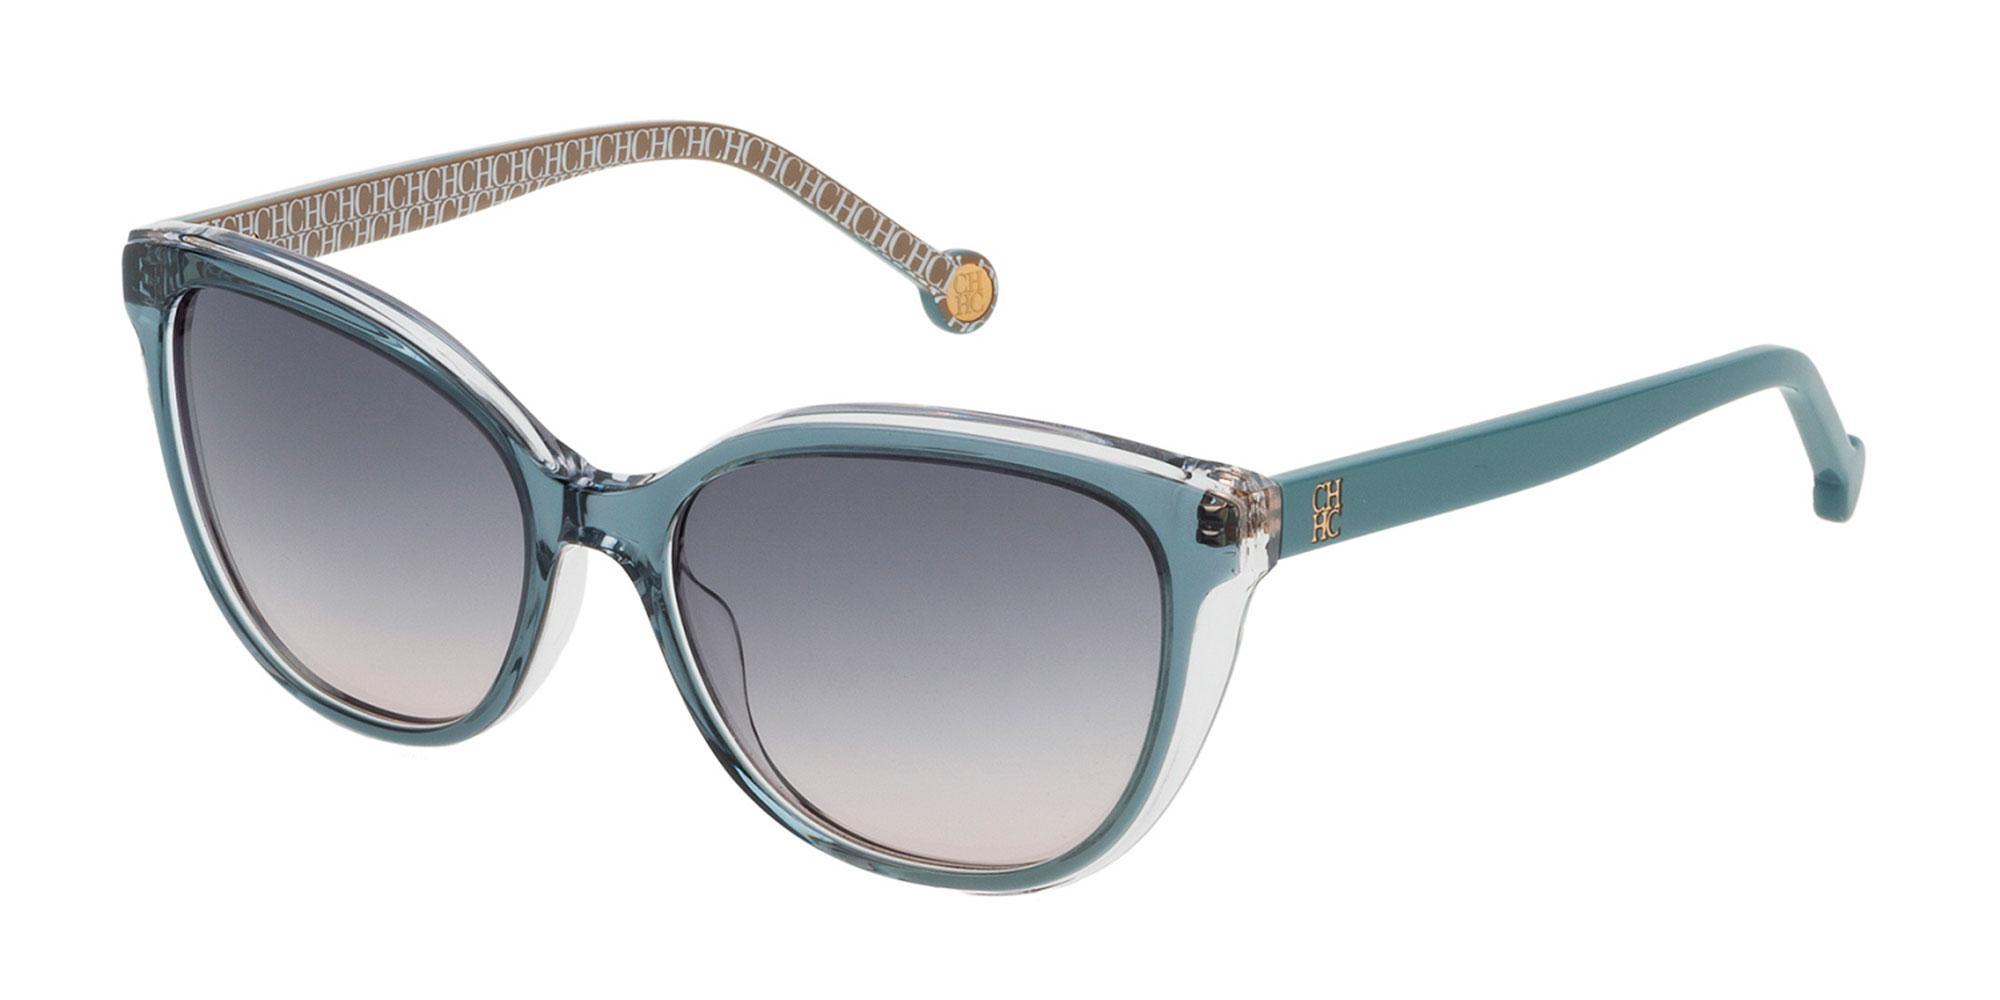 06MZ SHE694 Sunglasses, CH Carolina Herrera